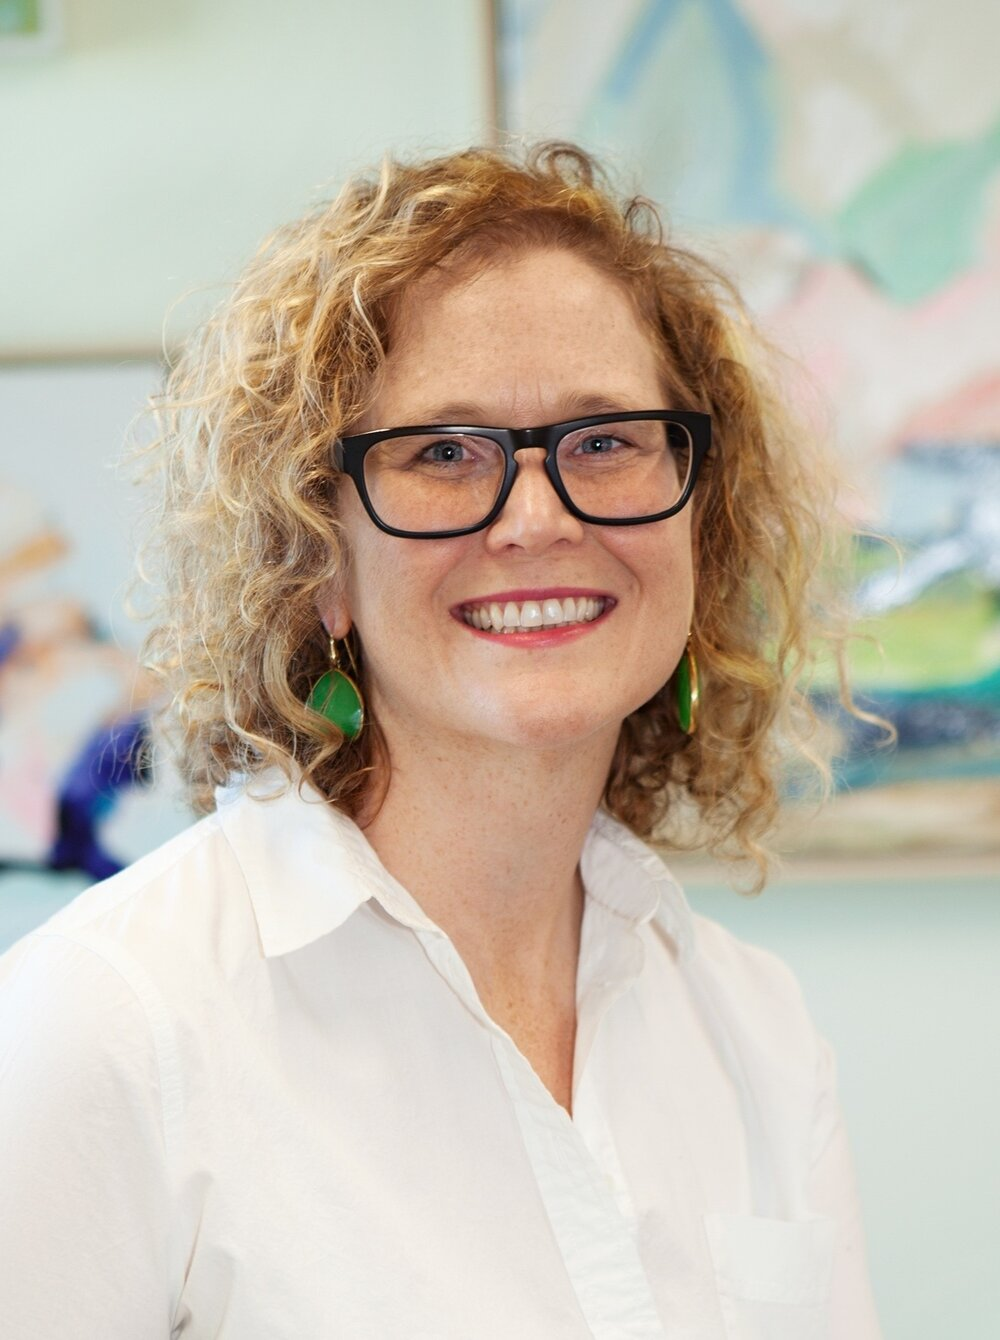 Kristin Daley, Ph.D., DBSM